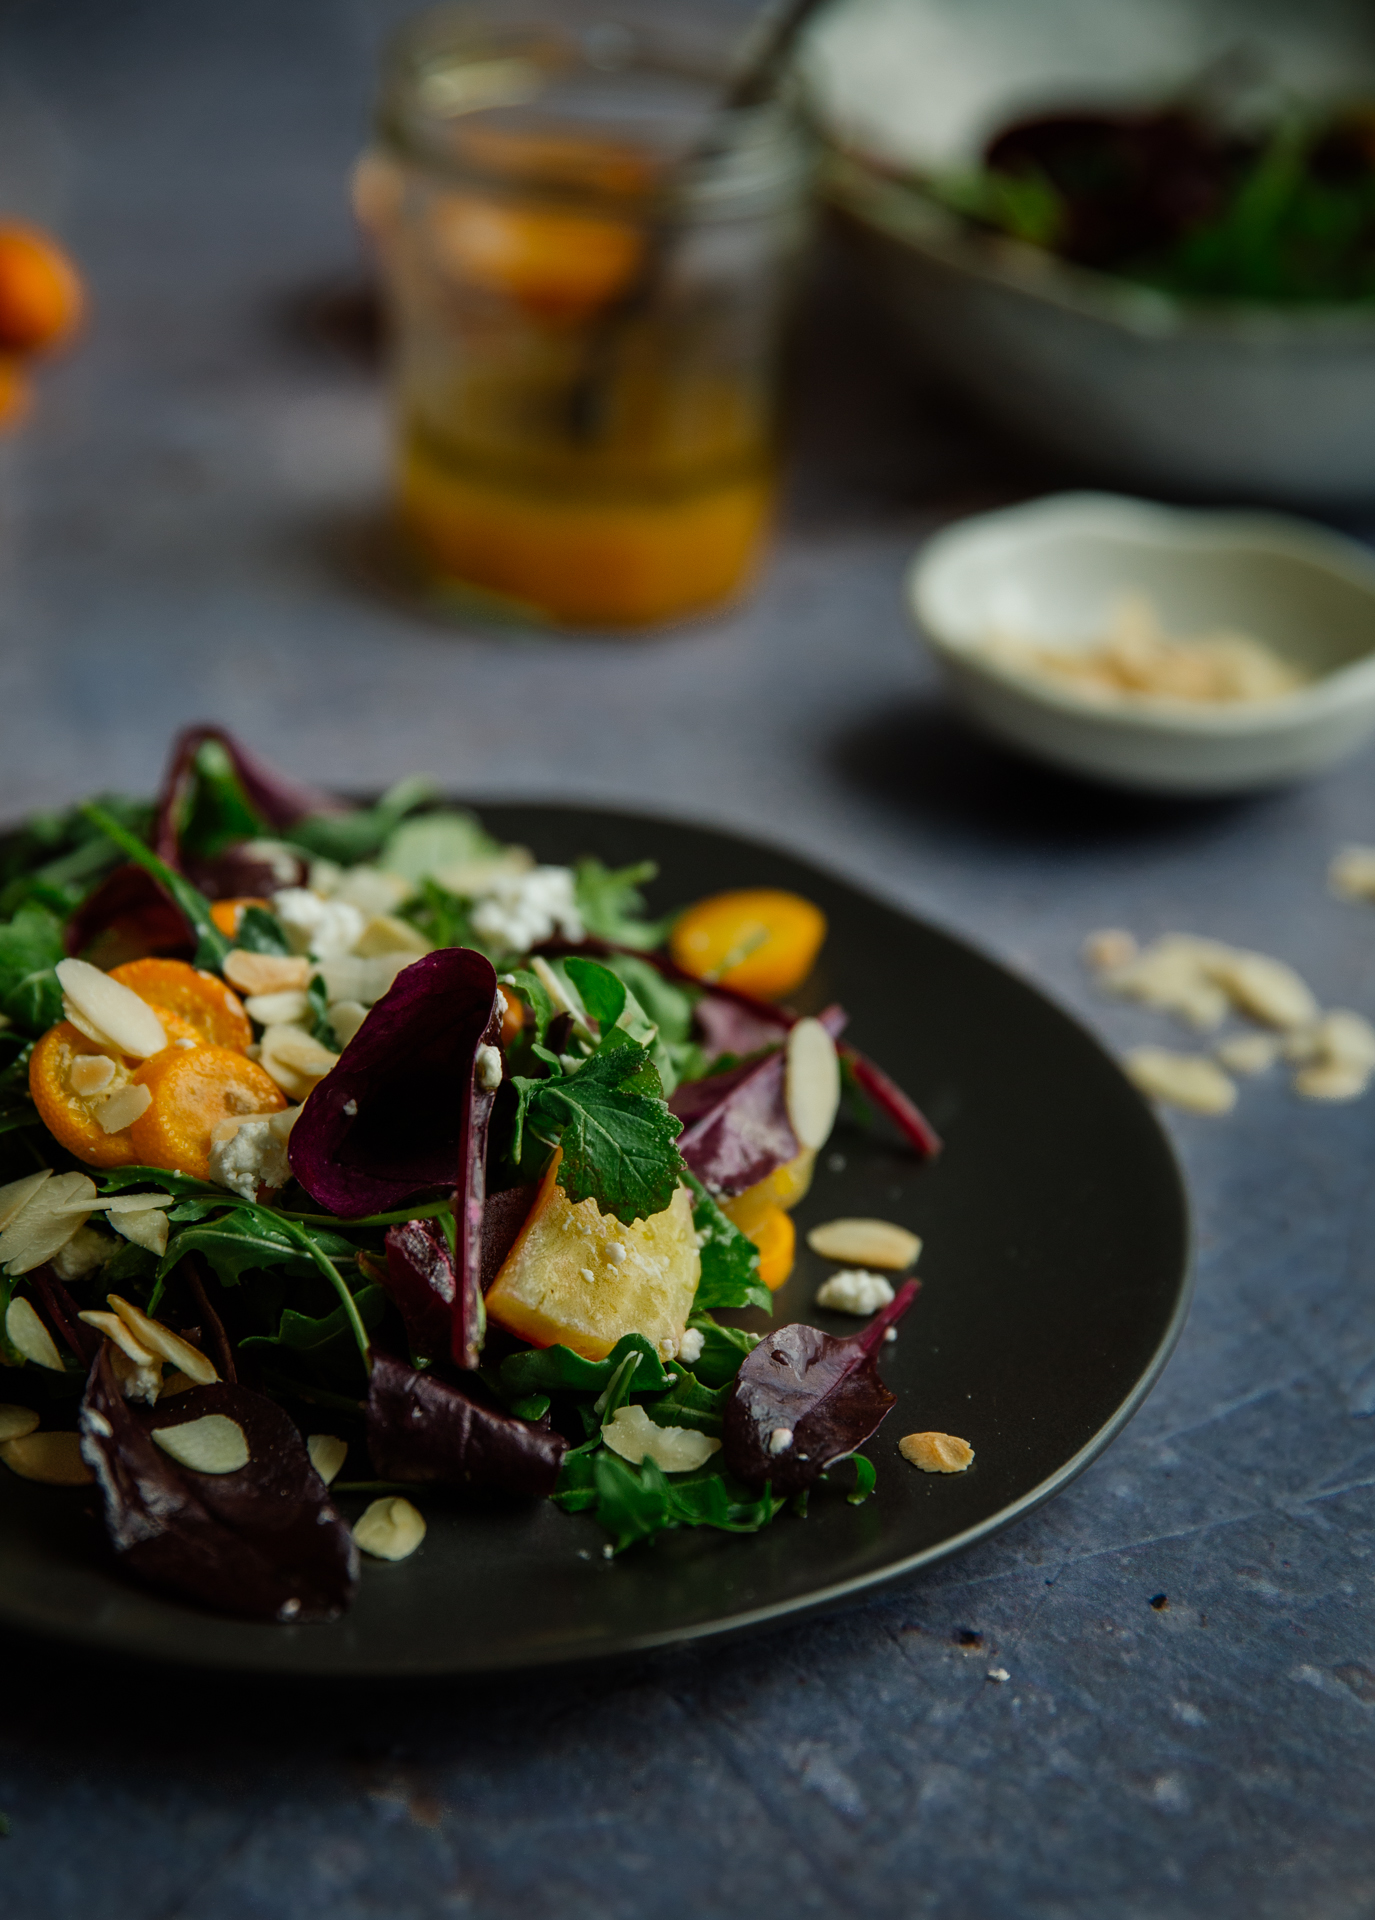 Beet & kumquat salad with maple & blood orange dressing